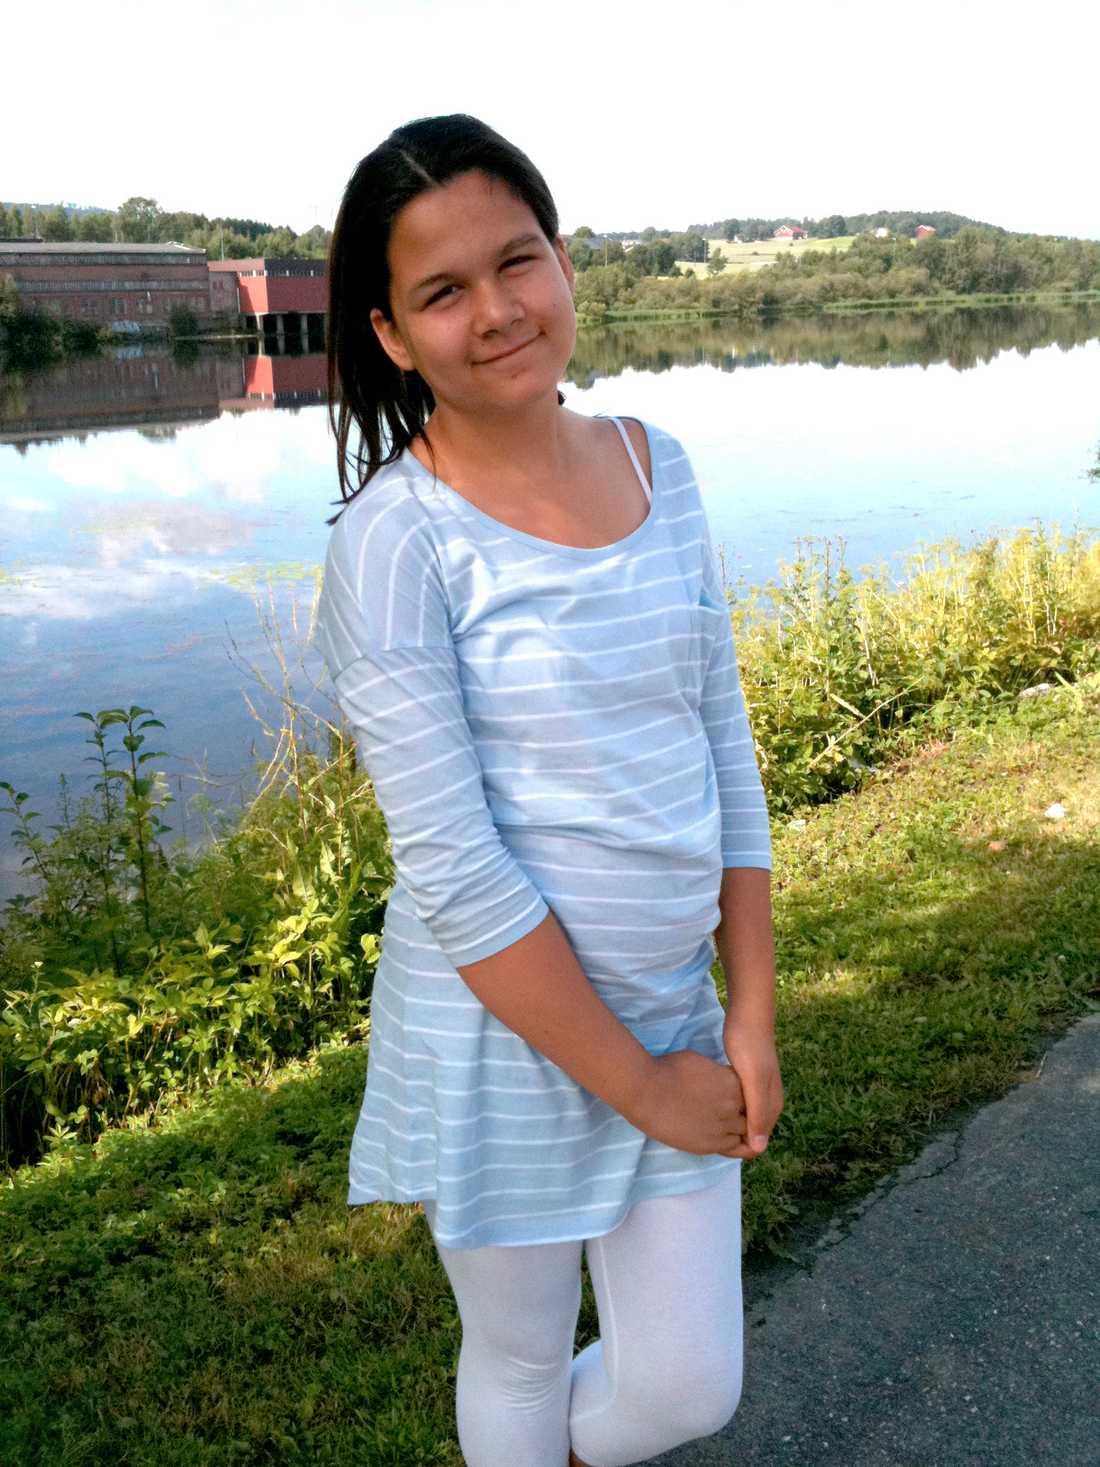 HADE NYSS FYLLT 14 Sharidyn Meegan Ngahiwi Svebakk-Bøhn dog under terrorattentatet på Utøya.